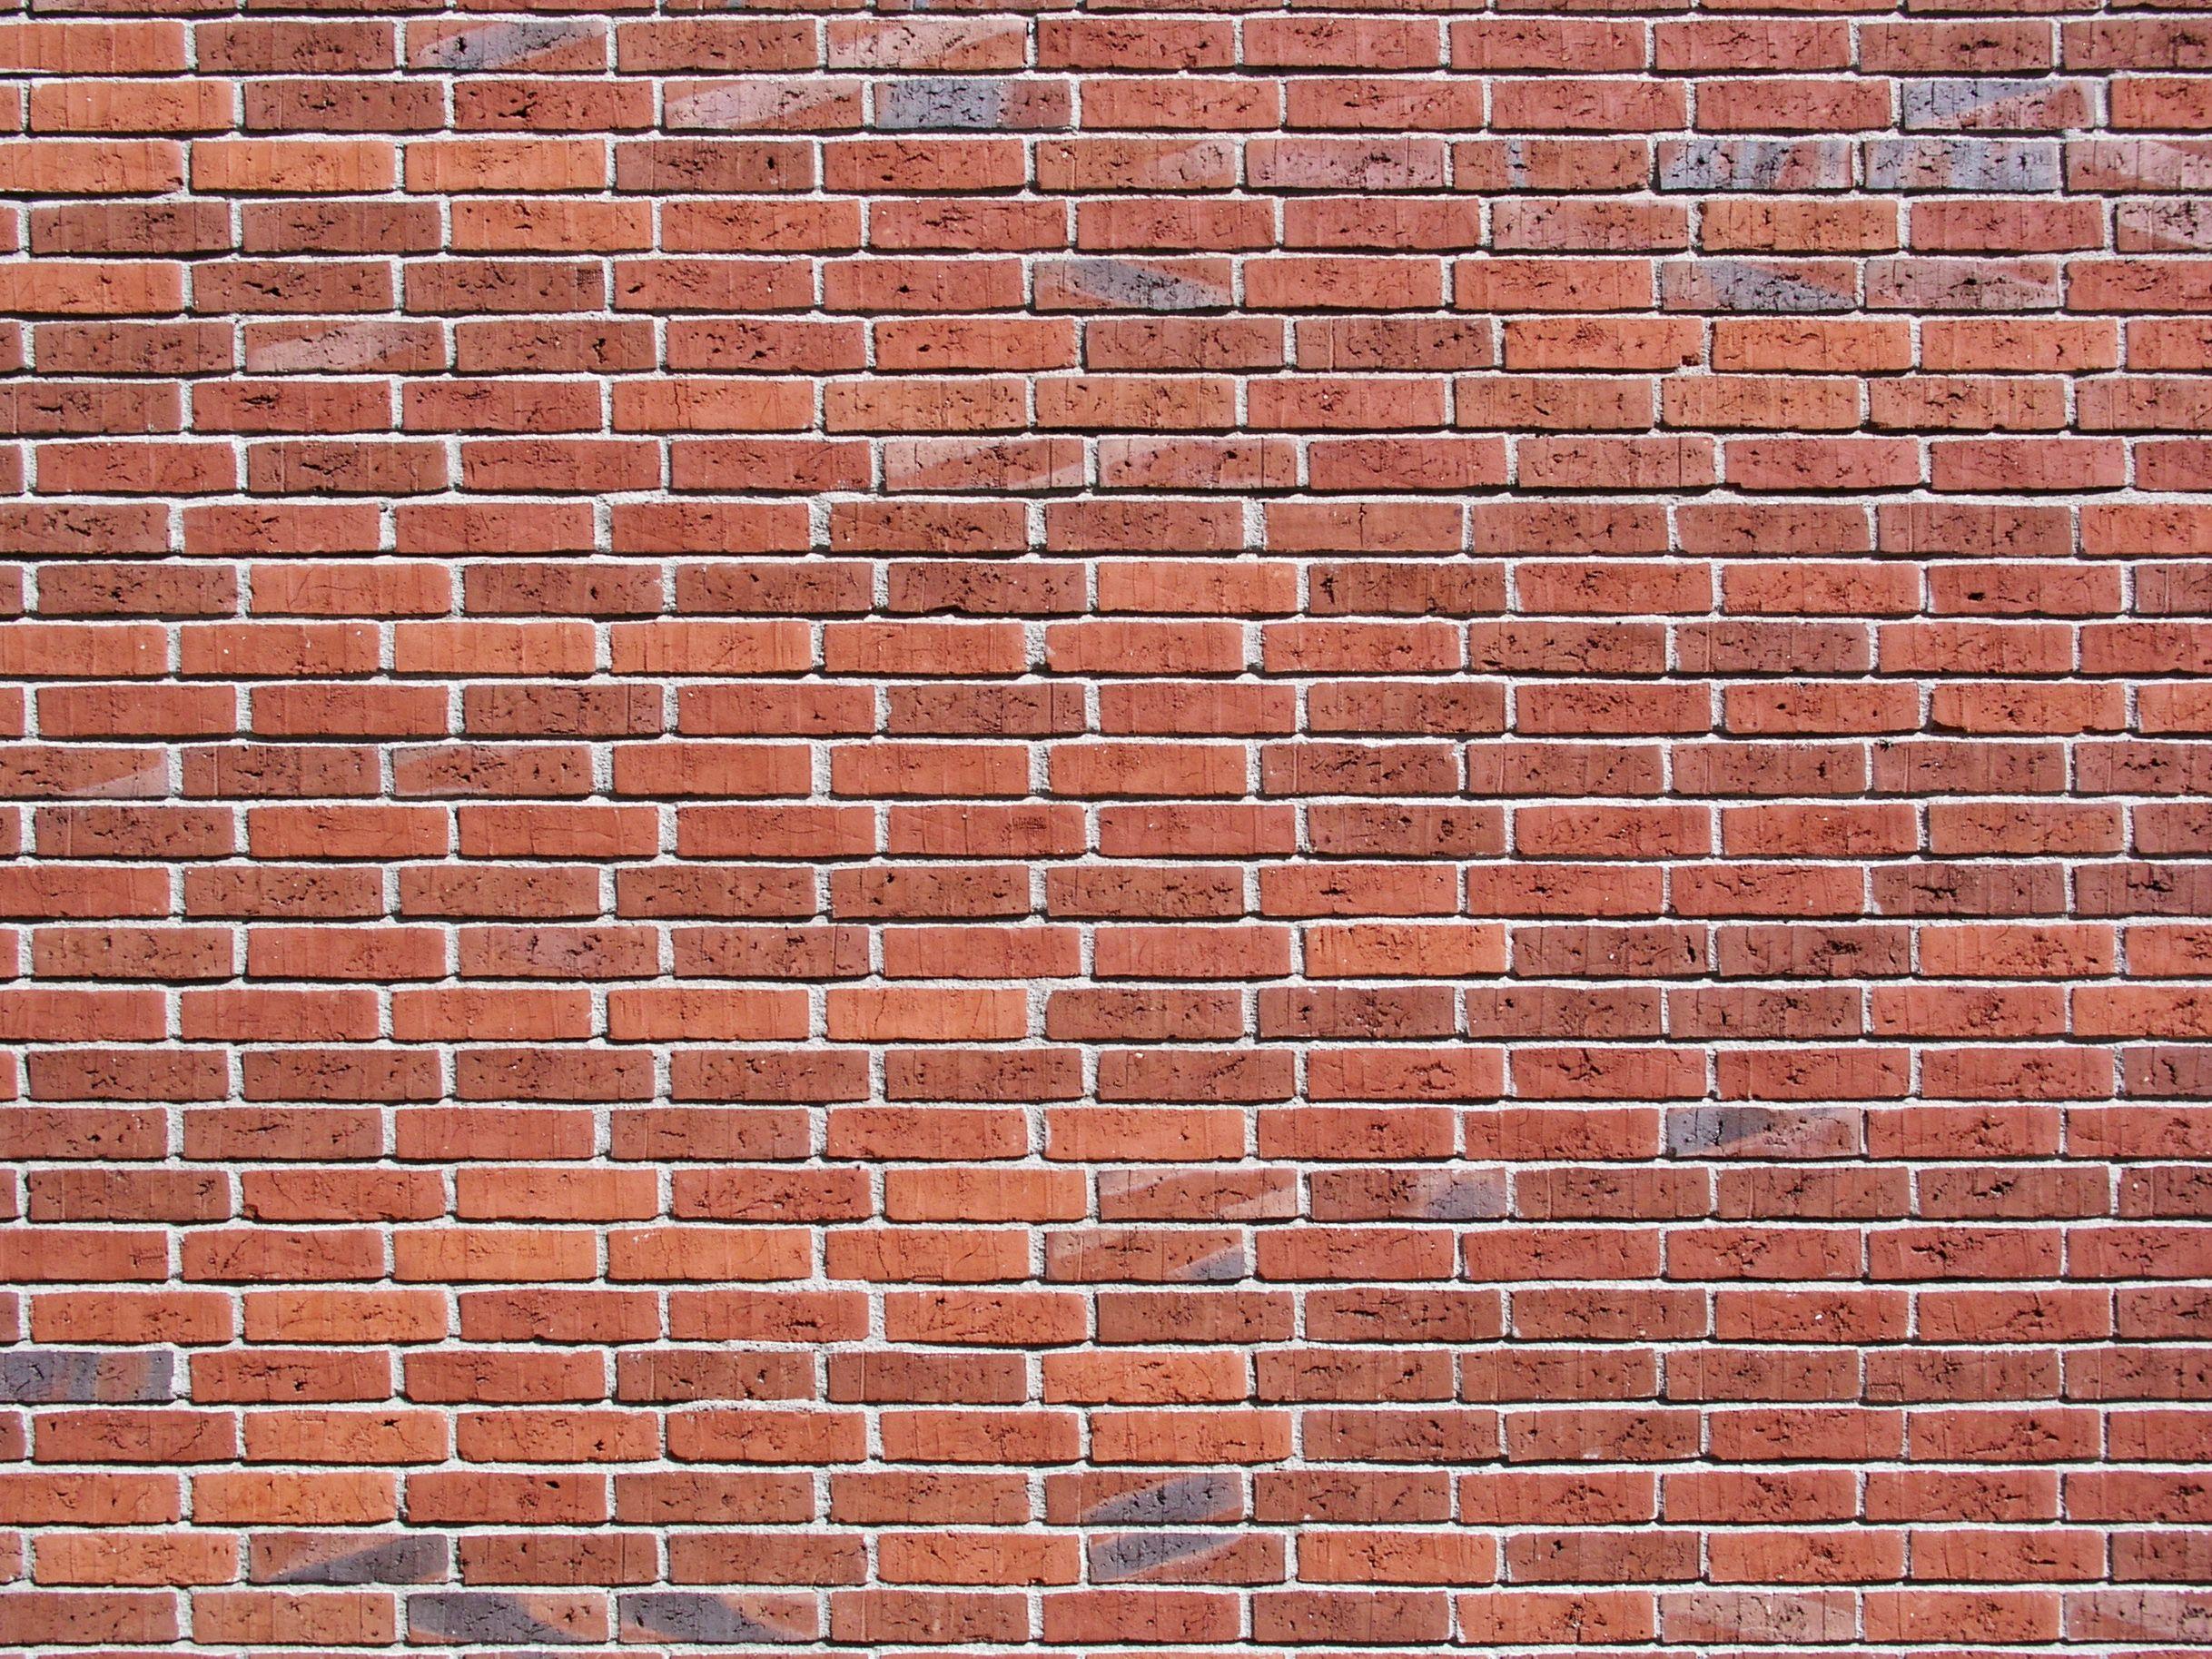 104 best materials - brick images on Pinterest